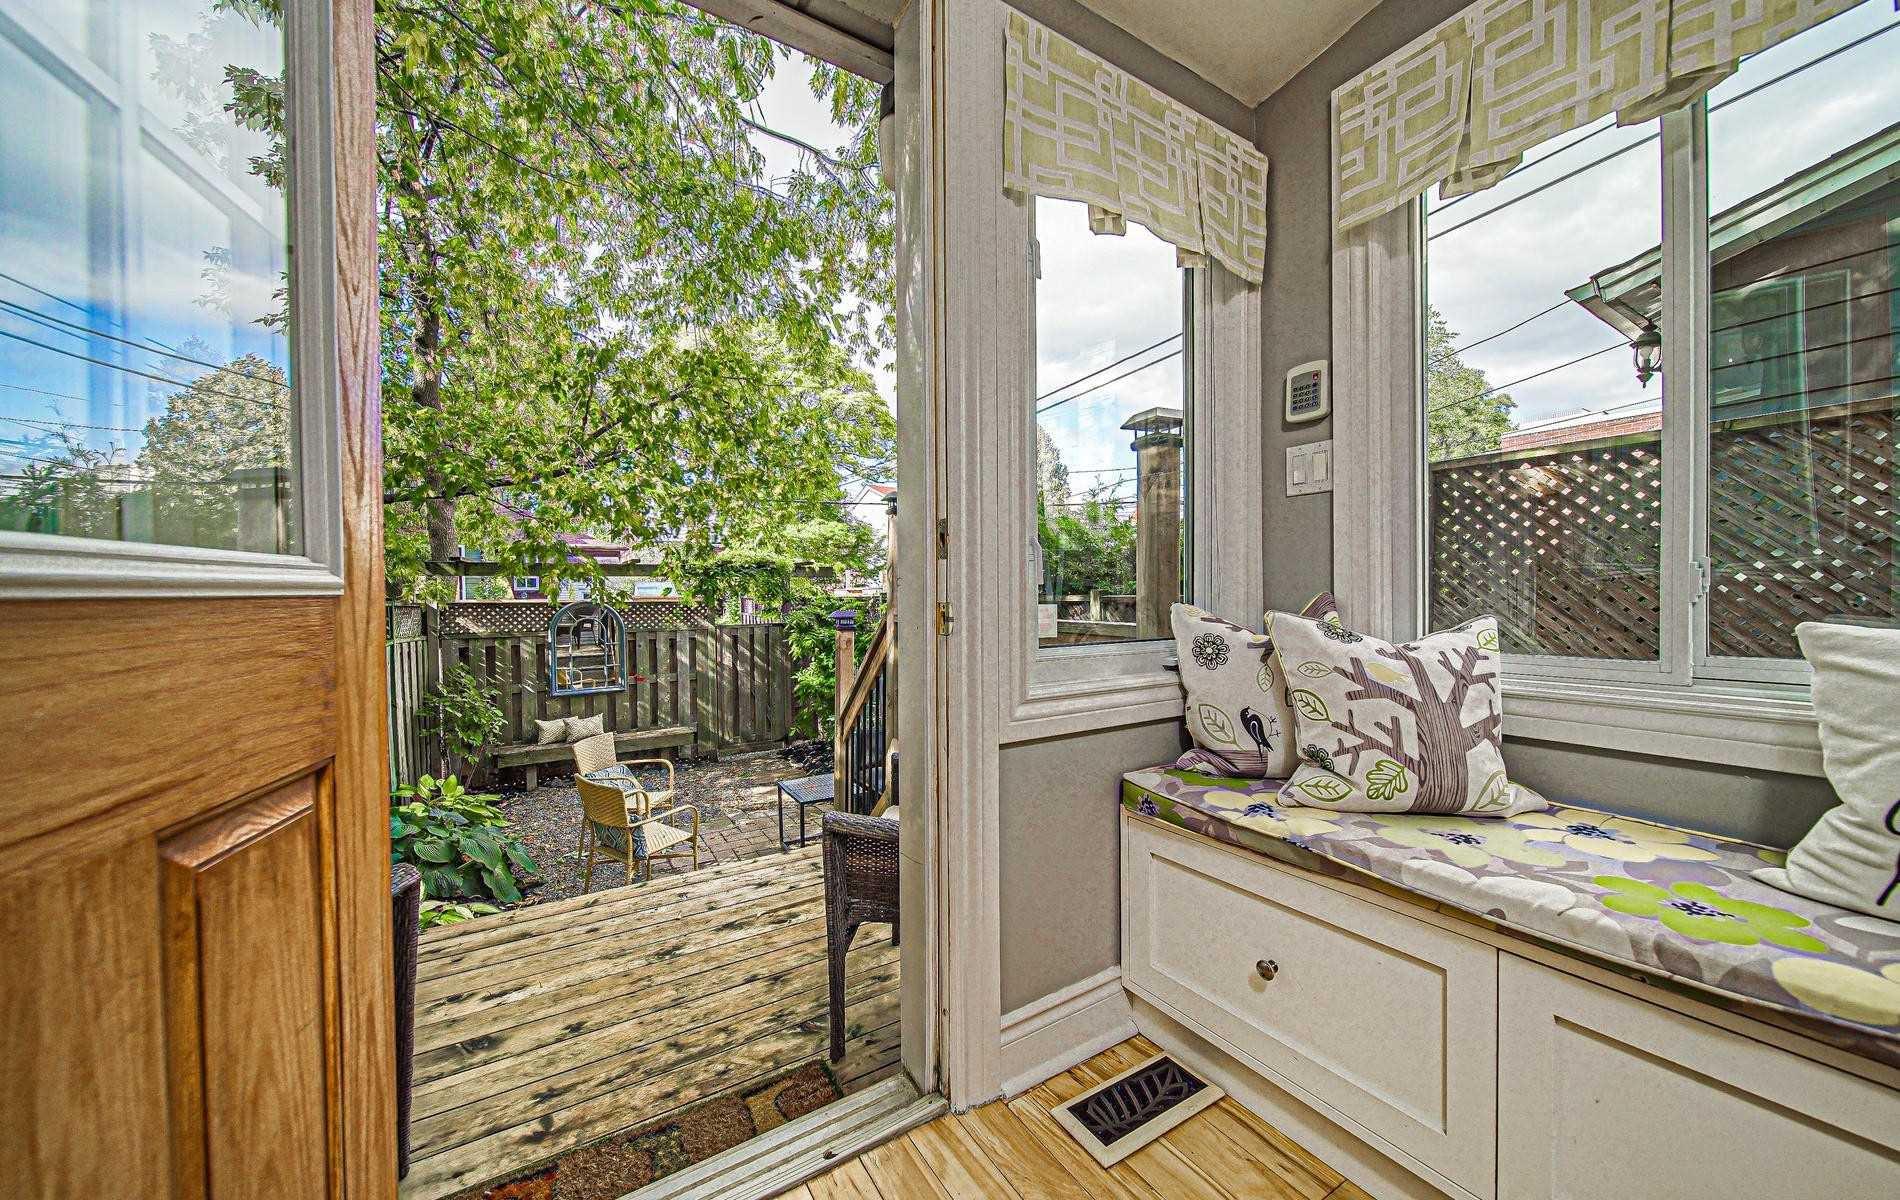 Photo 9: Photos: 84 Rushbrooke Avenue in Toronto: South Riverdale House (2-Storey) for sale (Toronto E01)  : MLS®# E4600791